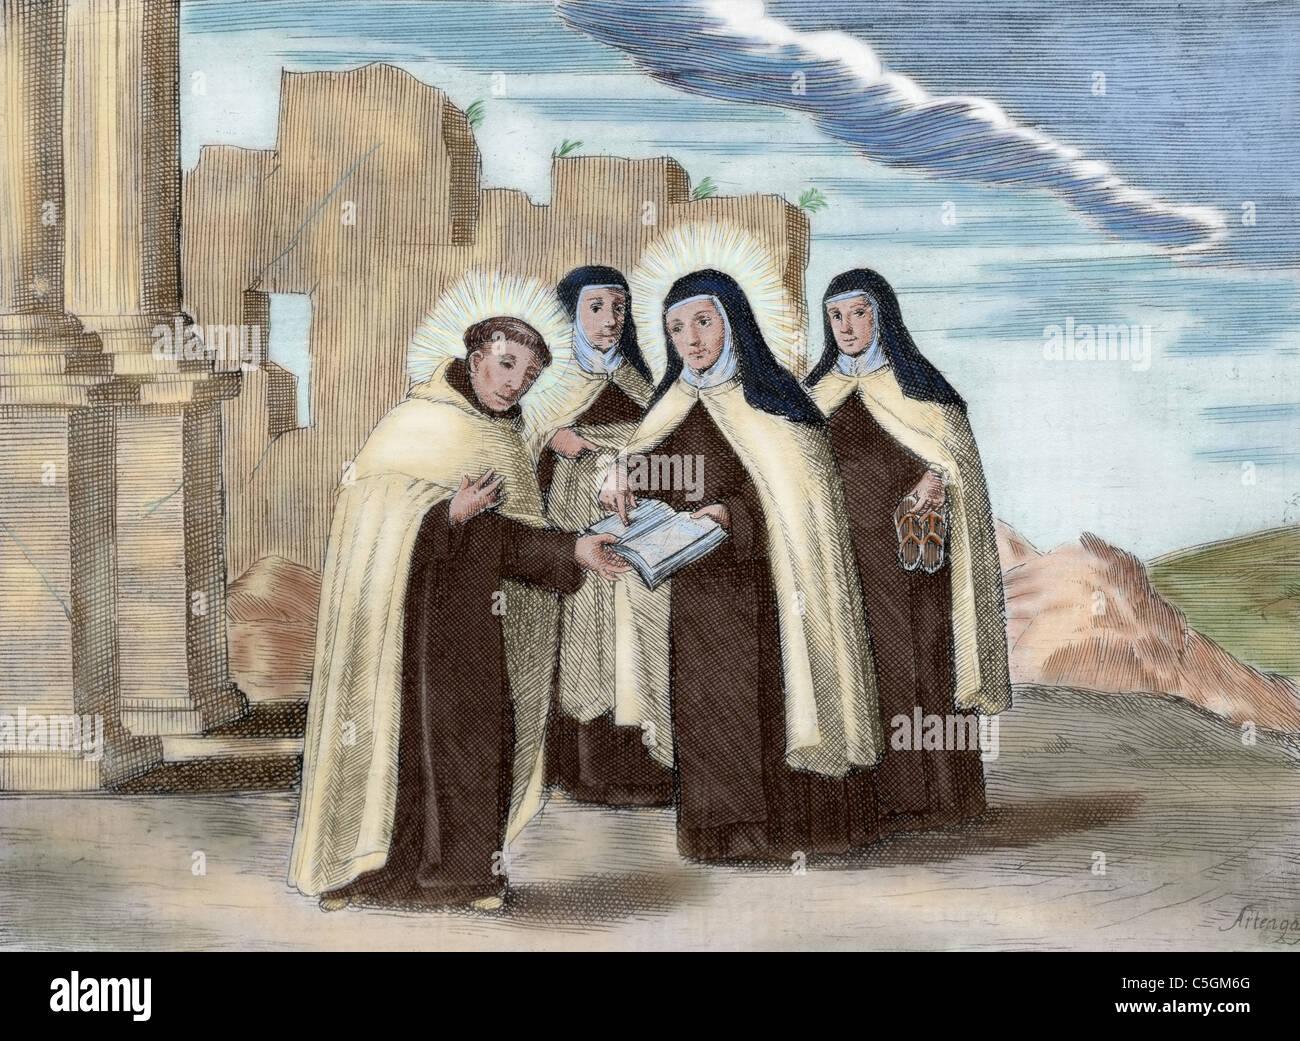 Discalced Carmelite Stock Photos & Discalced Carmelite Stock